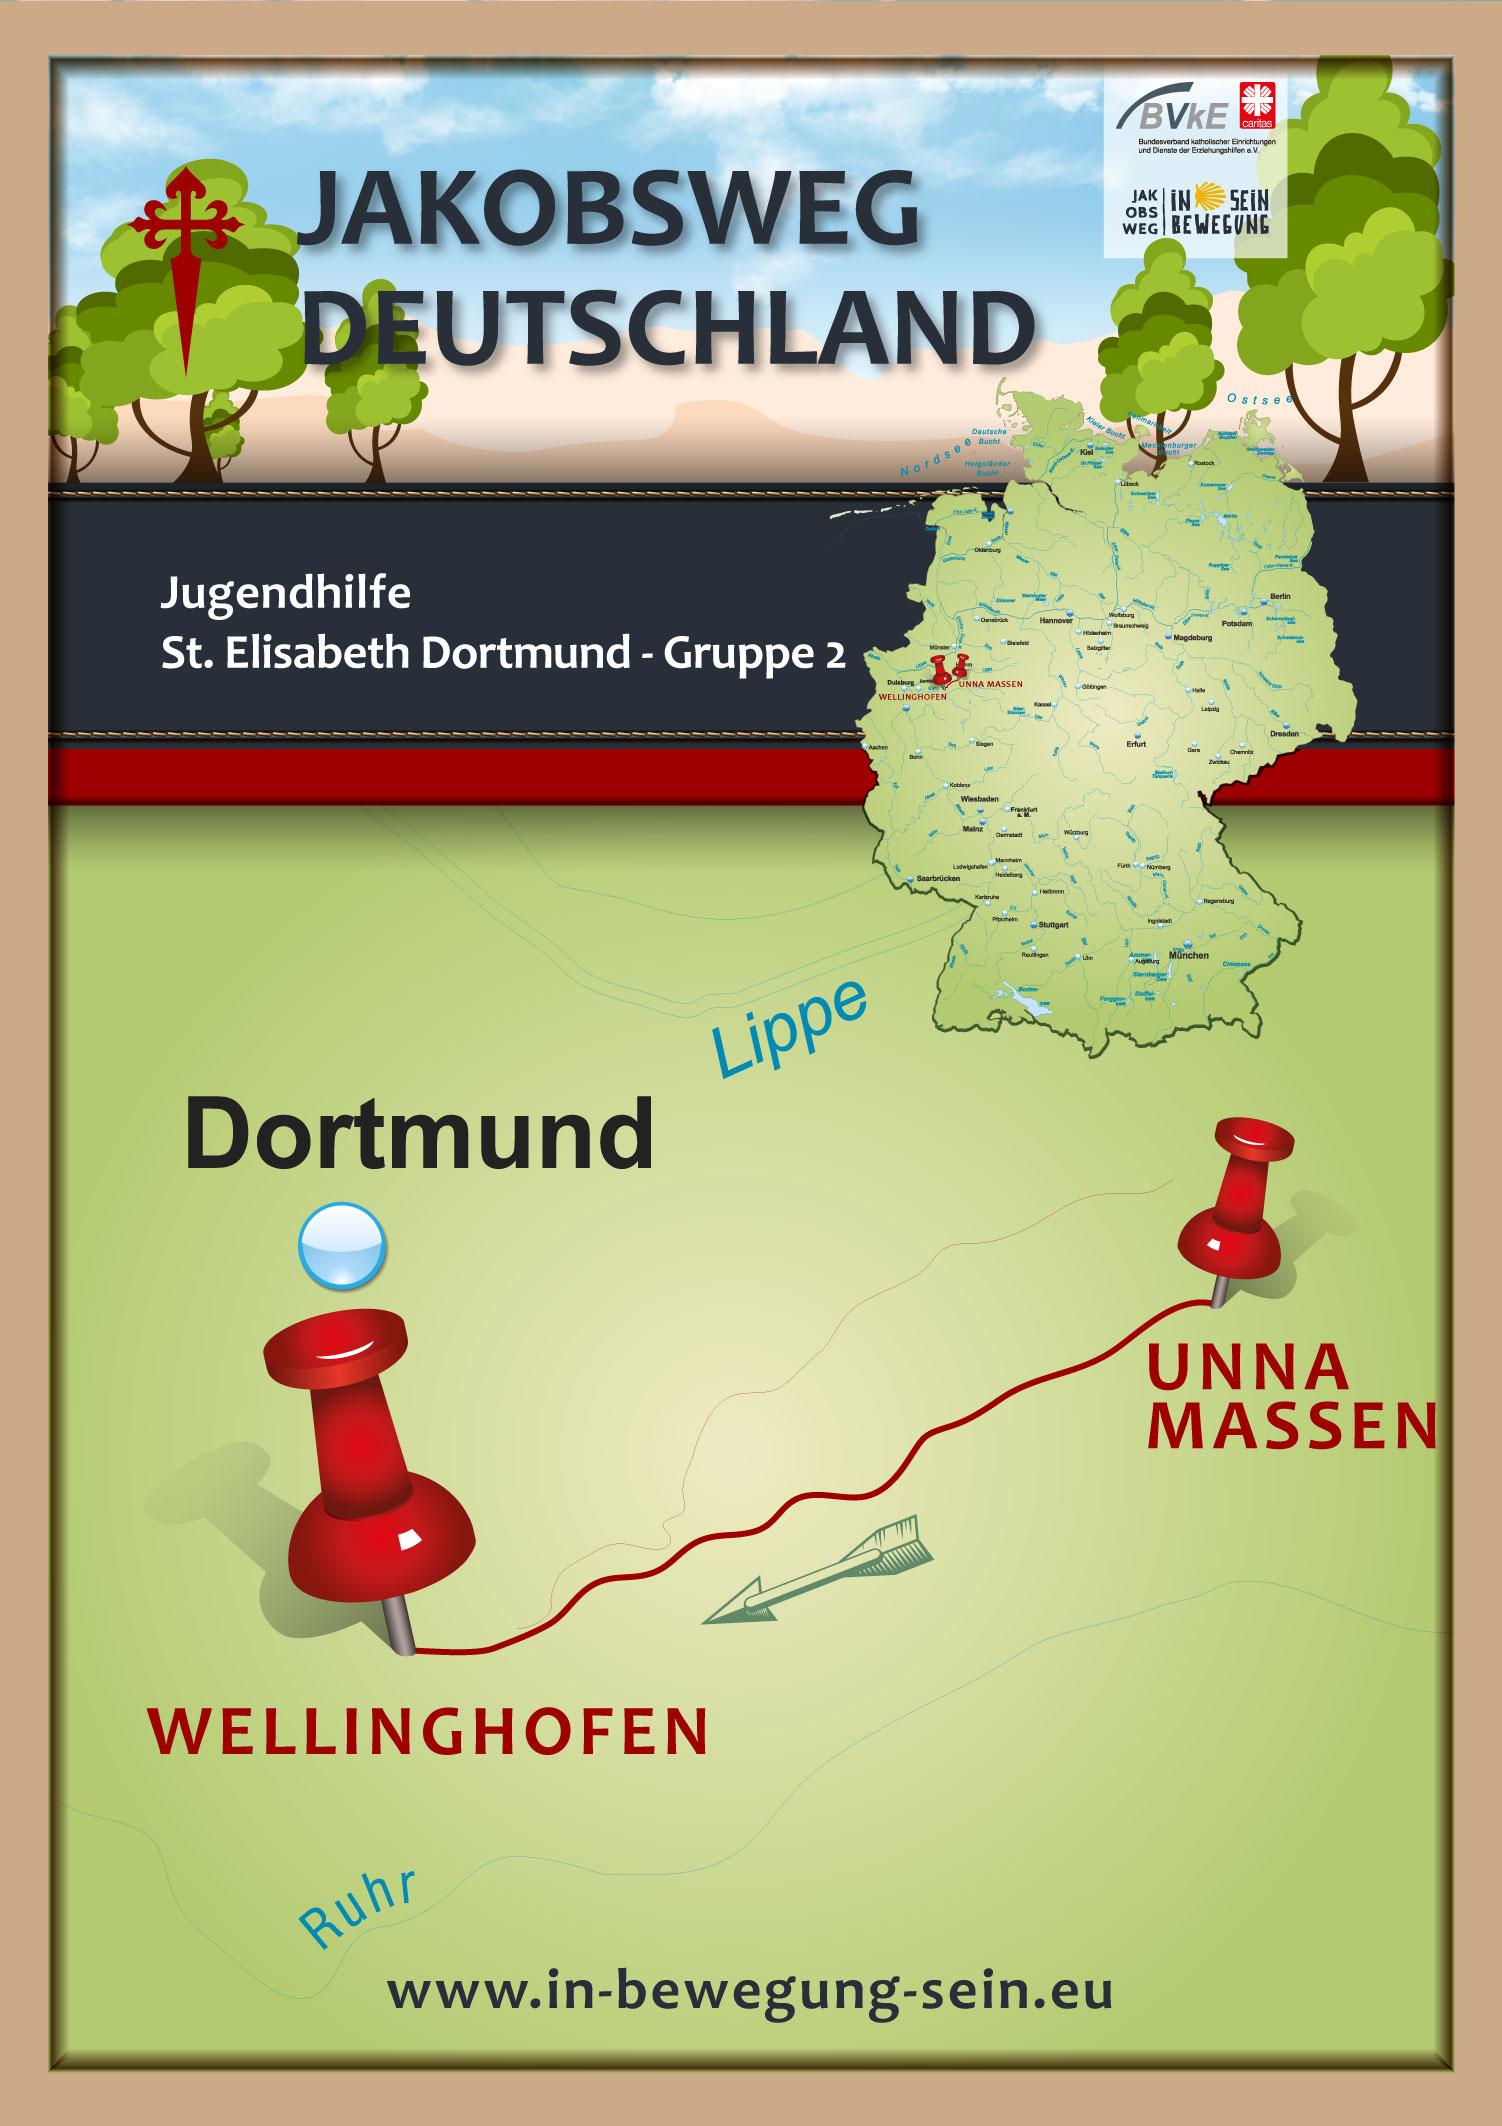 Posterkarte-Josefshaus-Jugendhilfe-St-Elisabeth-Dortmund-Gruppe-2-Plakat